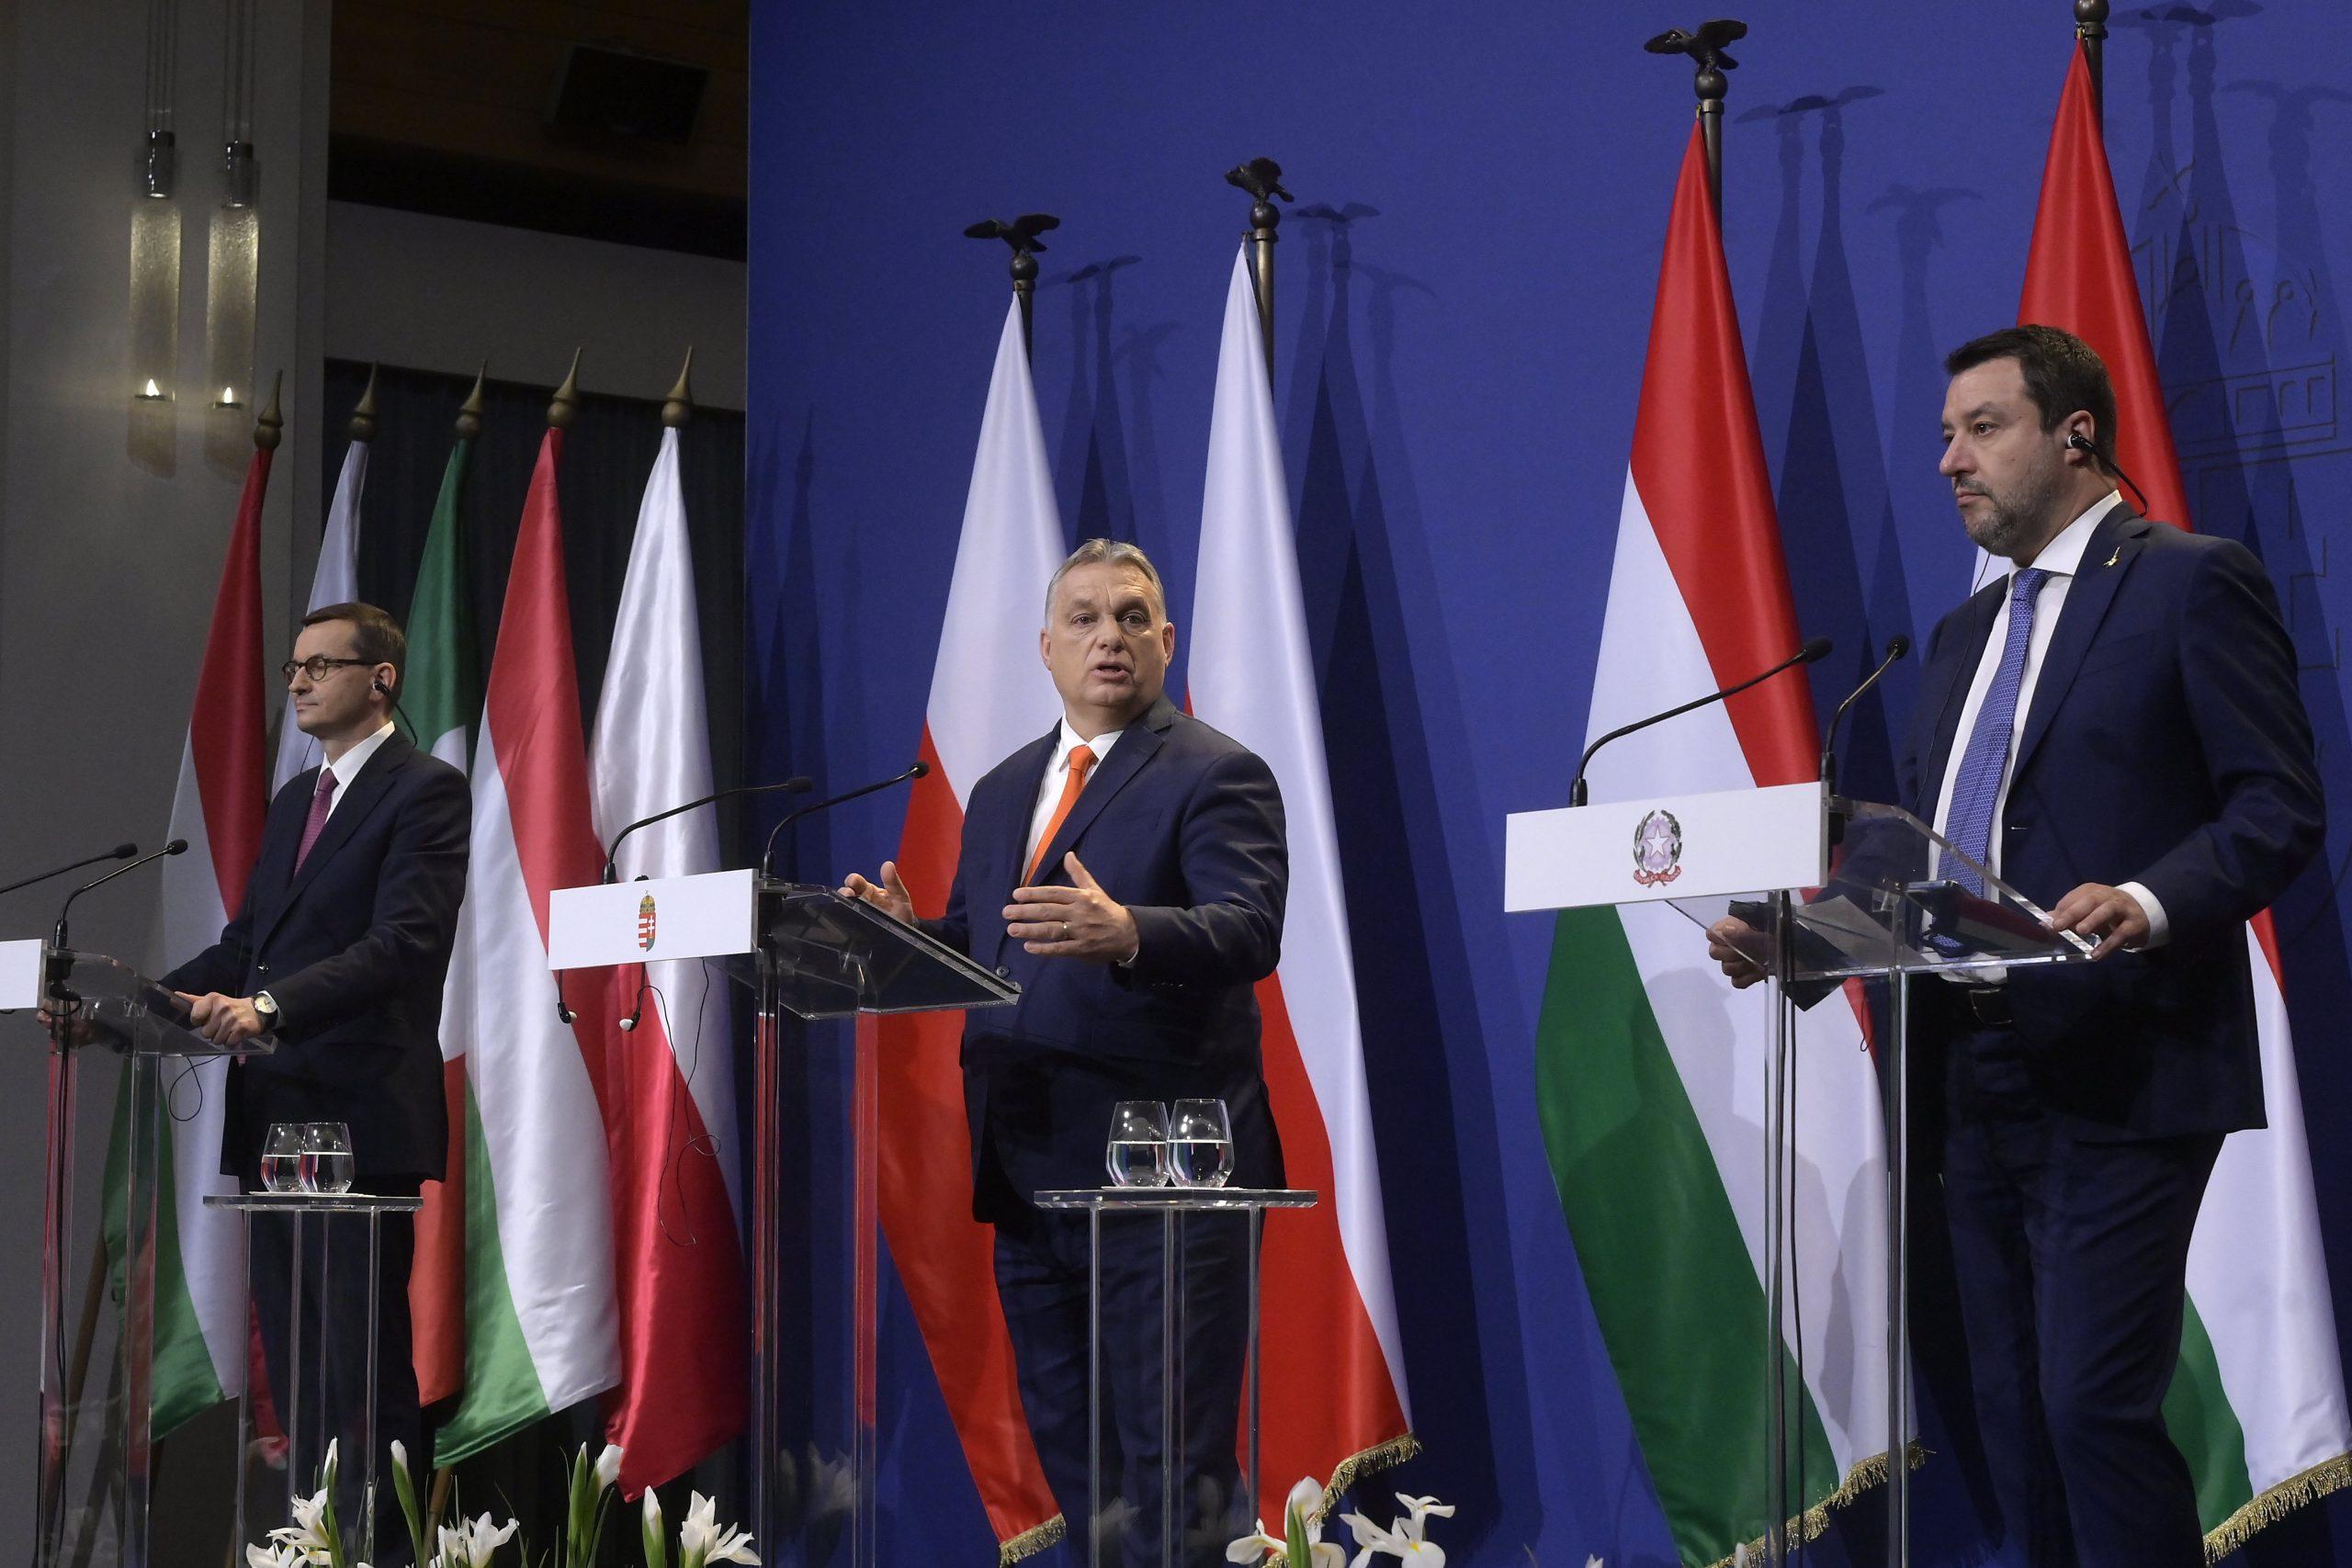 Orbán, Morawiecki, Salvini Call for 'Renaissance of Traditional European Values'